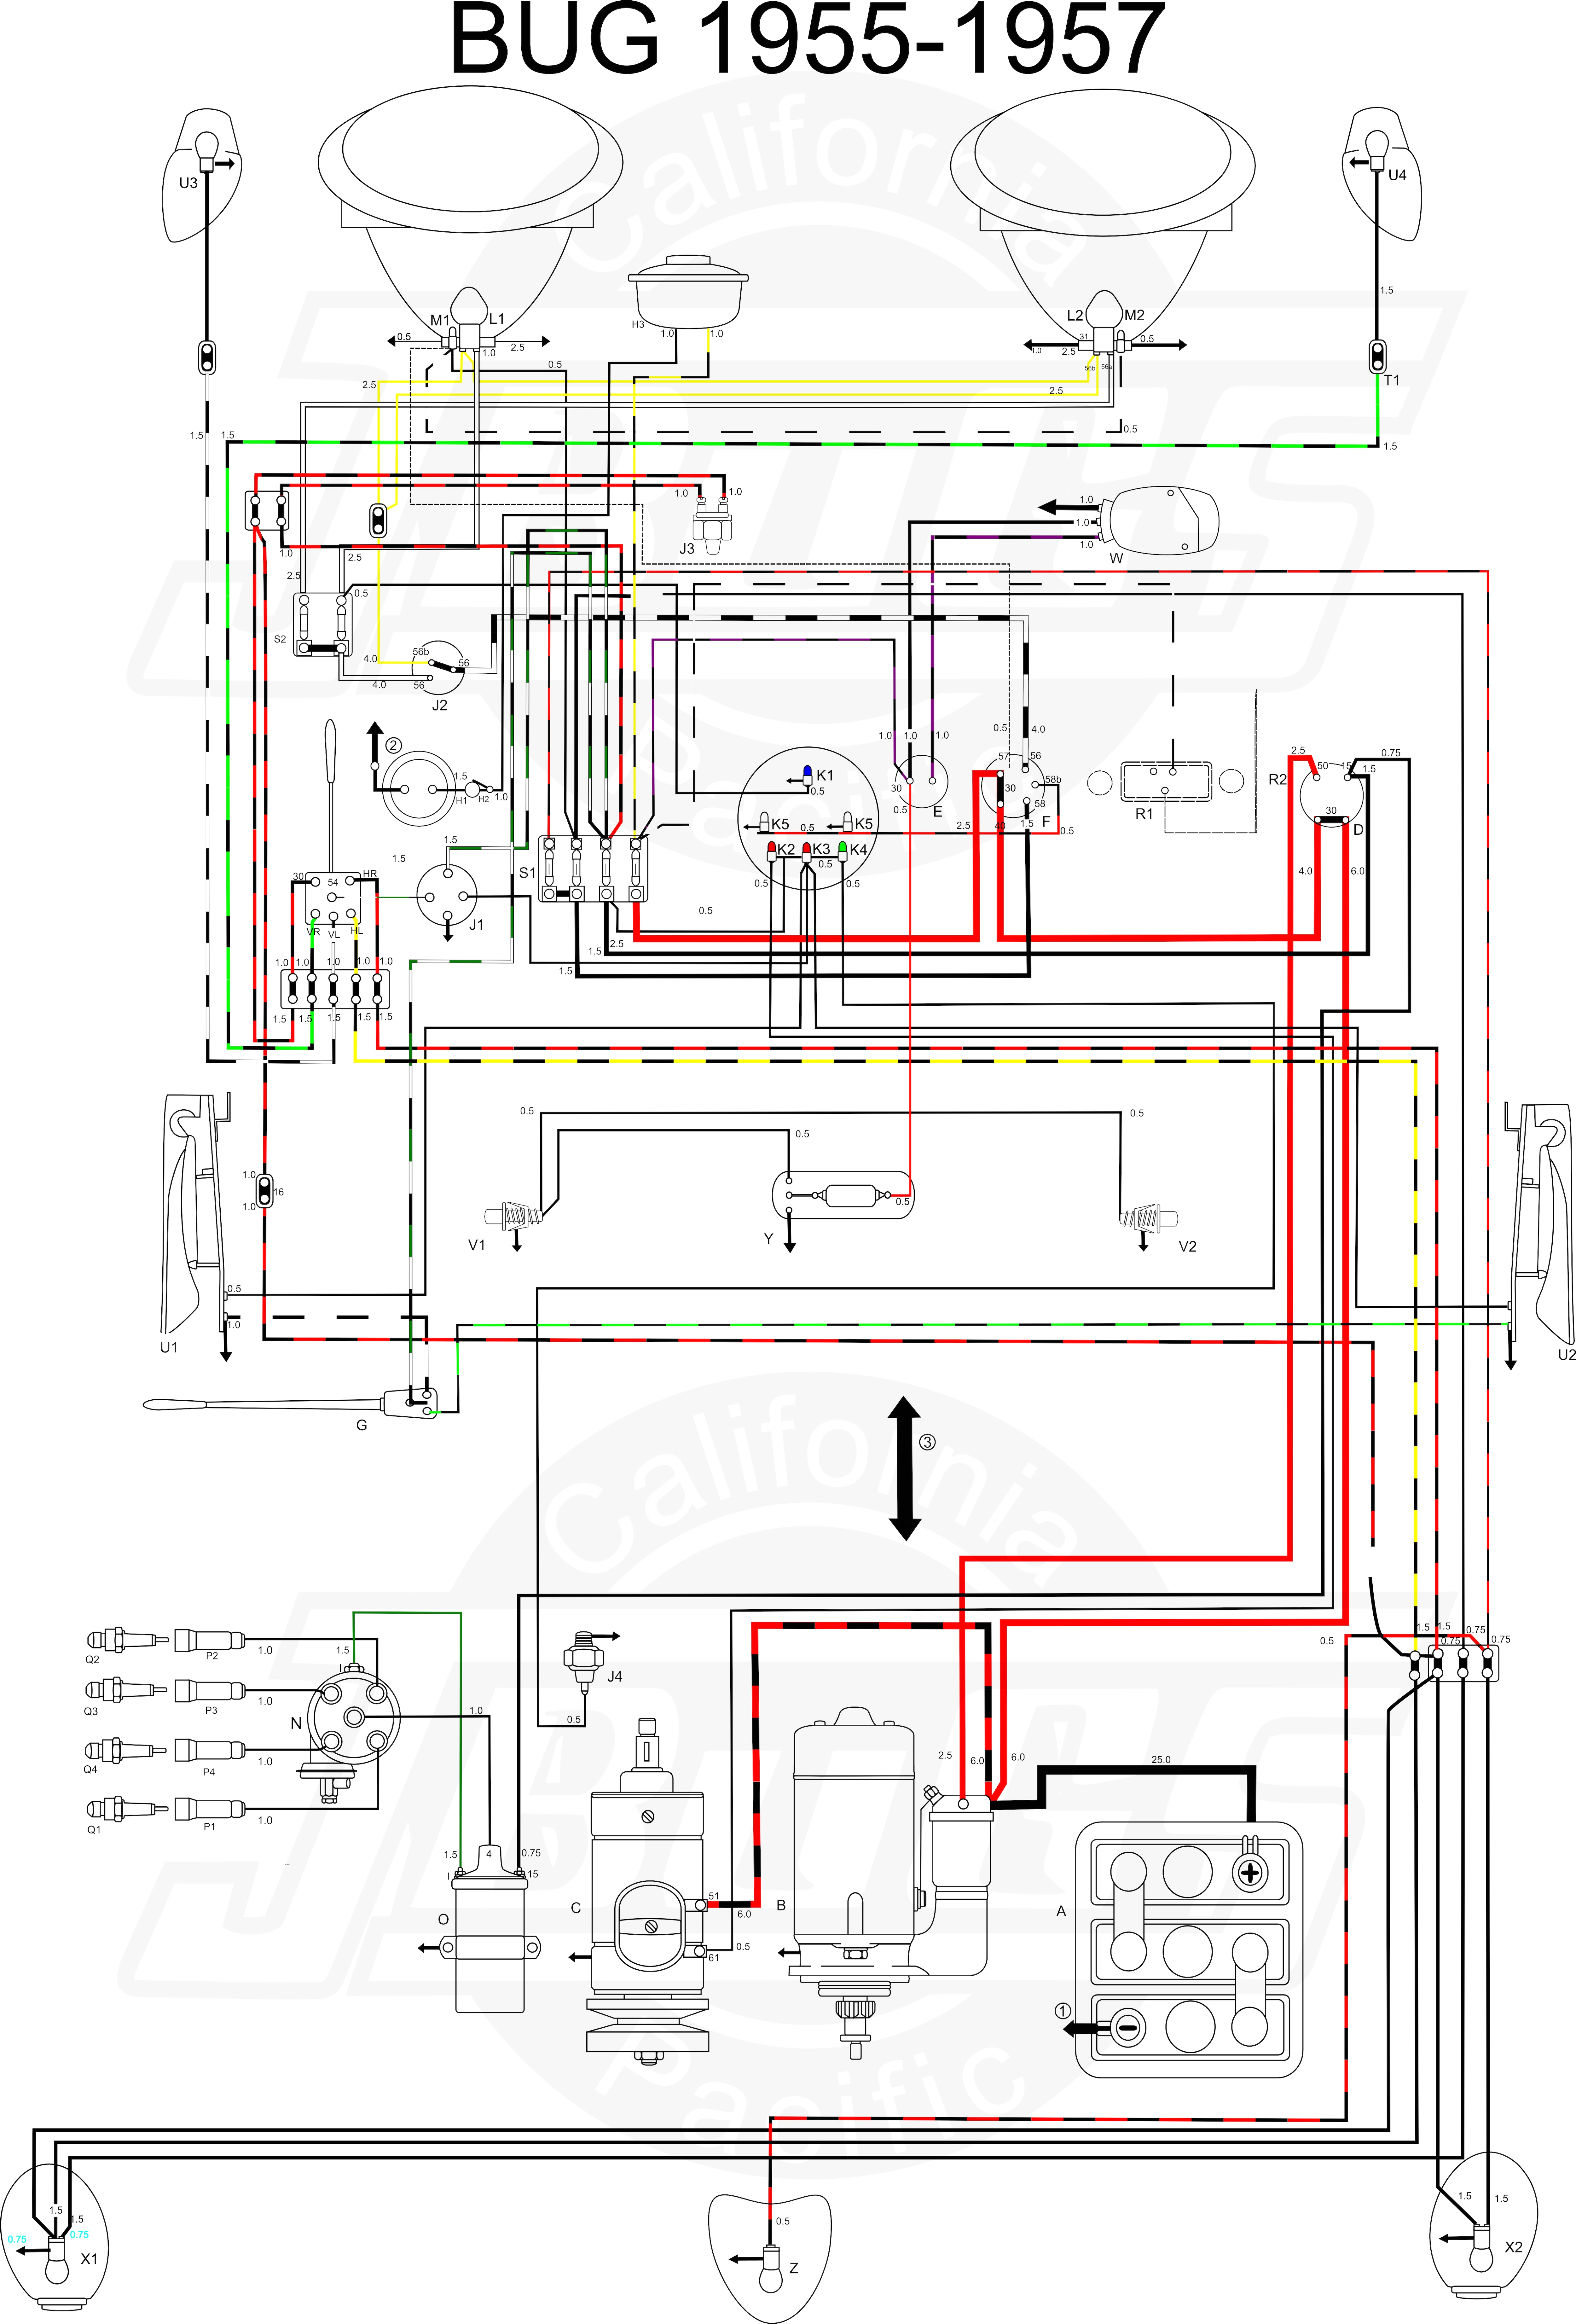 diagram volkswagen wiring 78vanagon wiring diagram details mix diagram volkswagen wiring 78vanagon wiring diagram img 1978 dome light wiring diagram vw bug